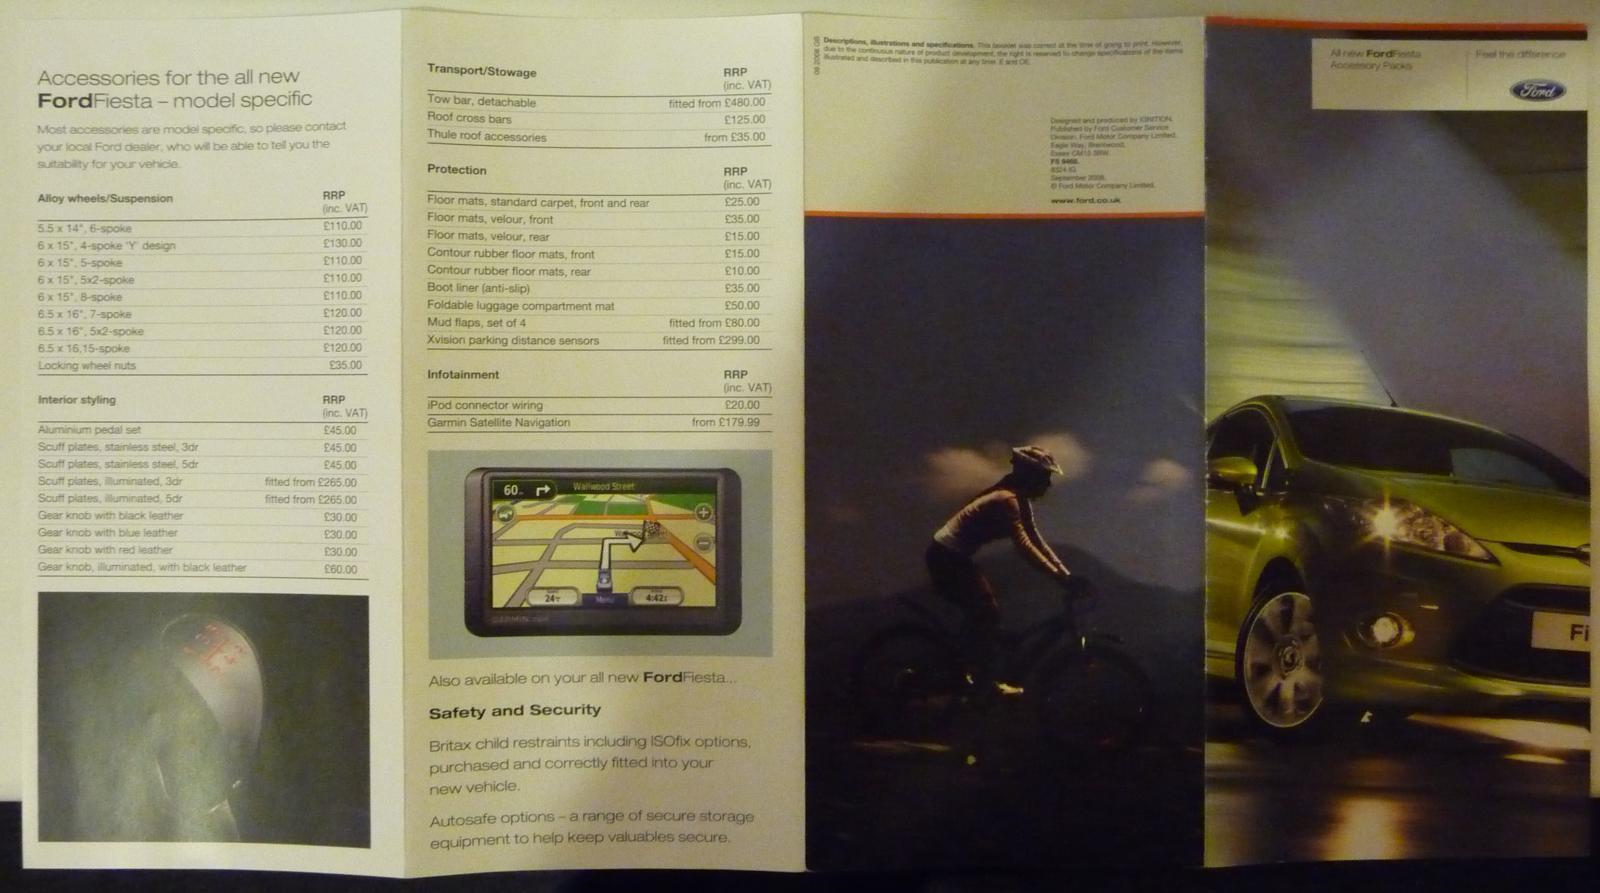 Ford Fiesta Accessory Brochure 2009 Part 2